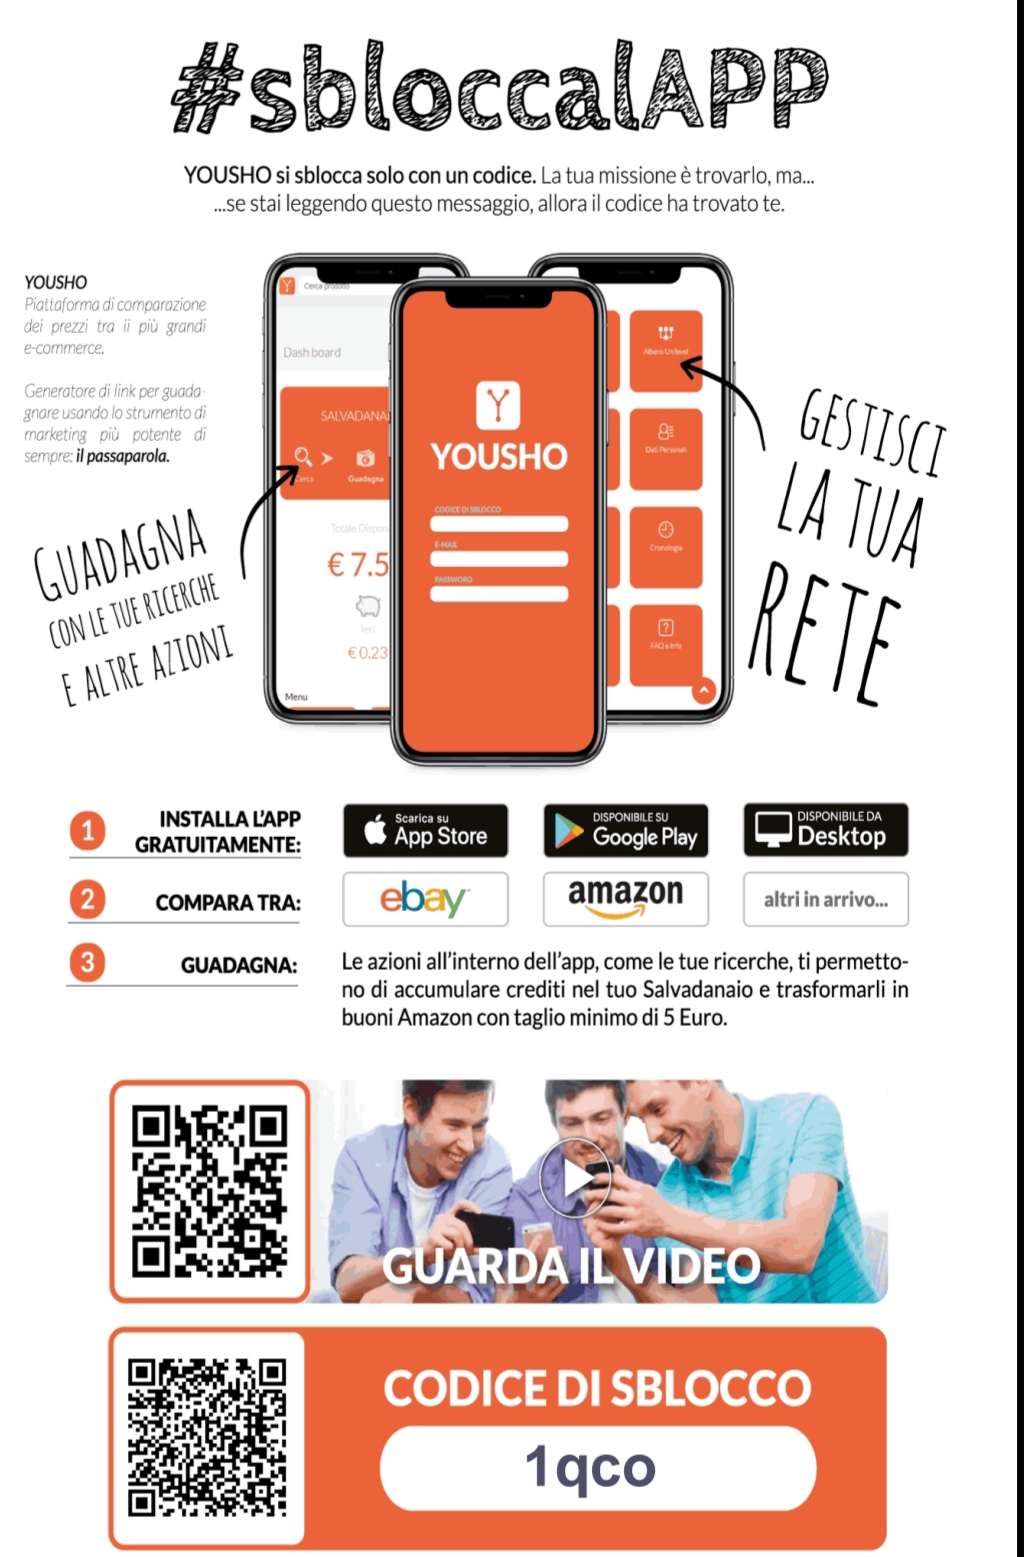 yousho-logo-corrado_cavarra_3